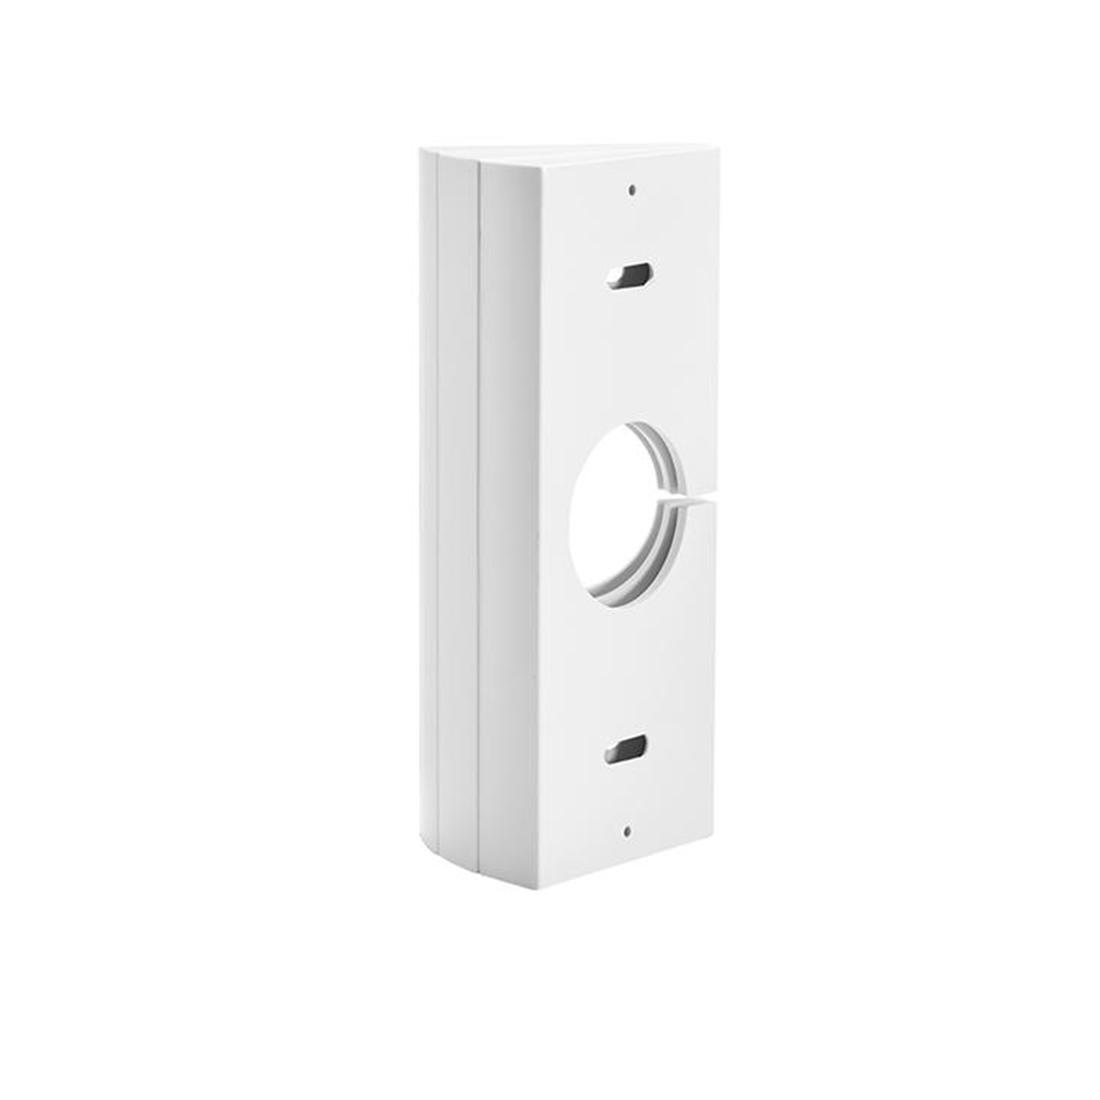 ring doorbell for sale femur anatomy diagram pro corner kit video